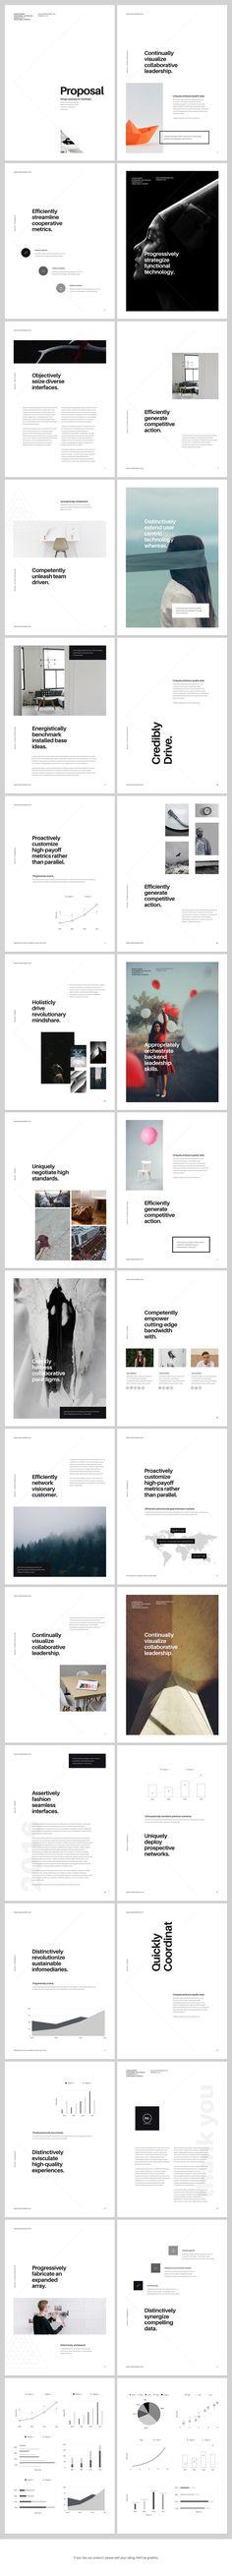 A4 Keynote Presentation for Print - Presentations - 2